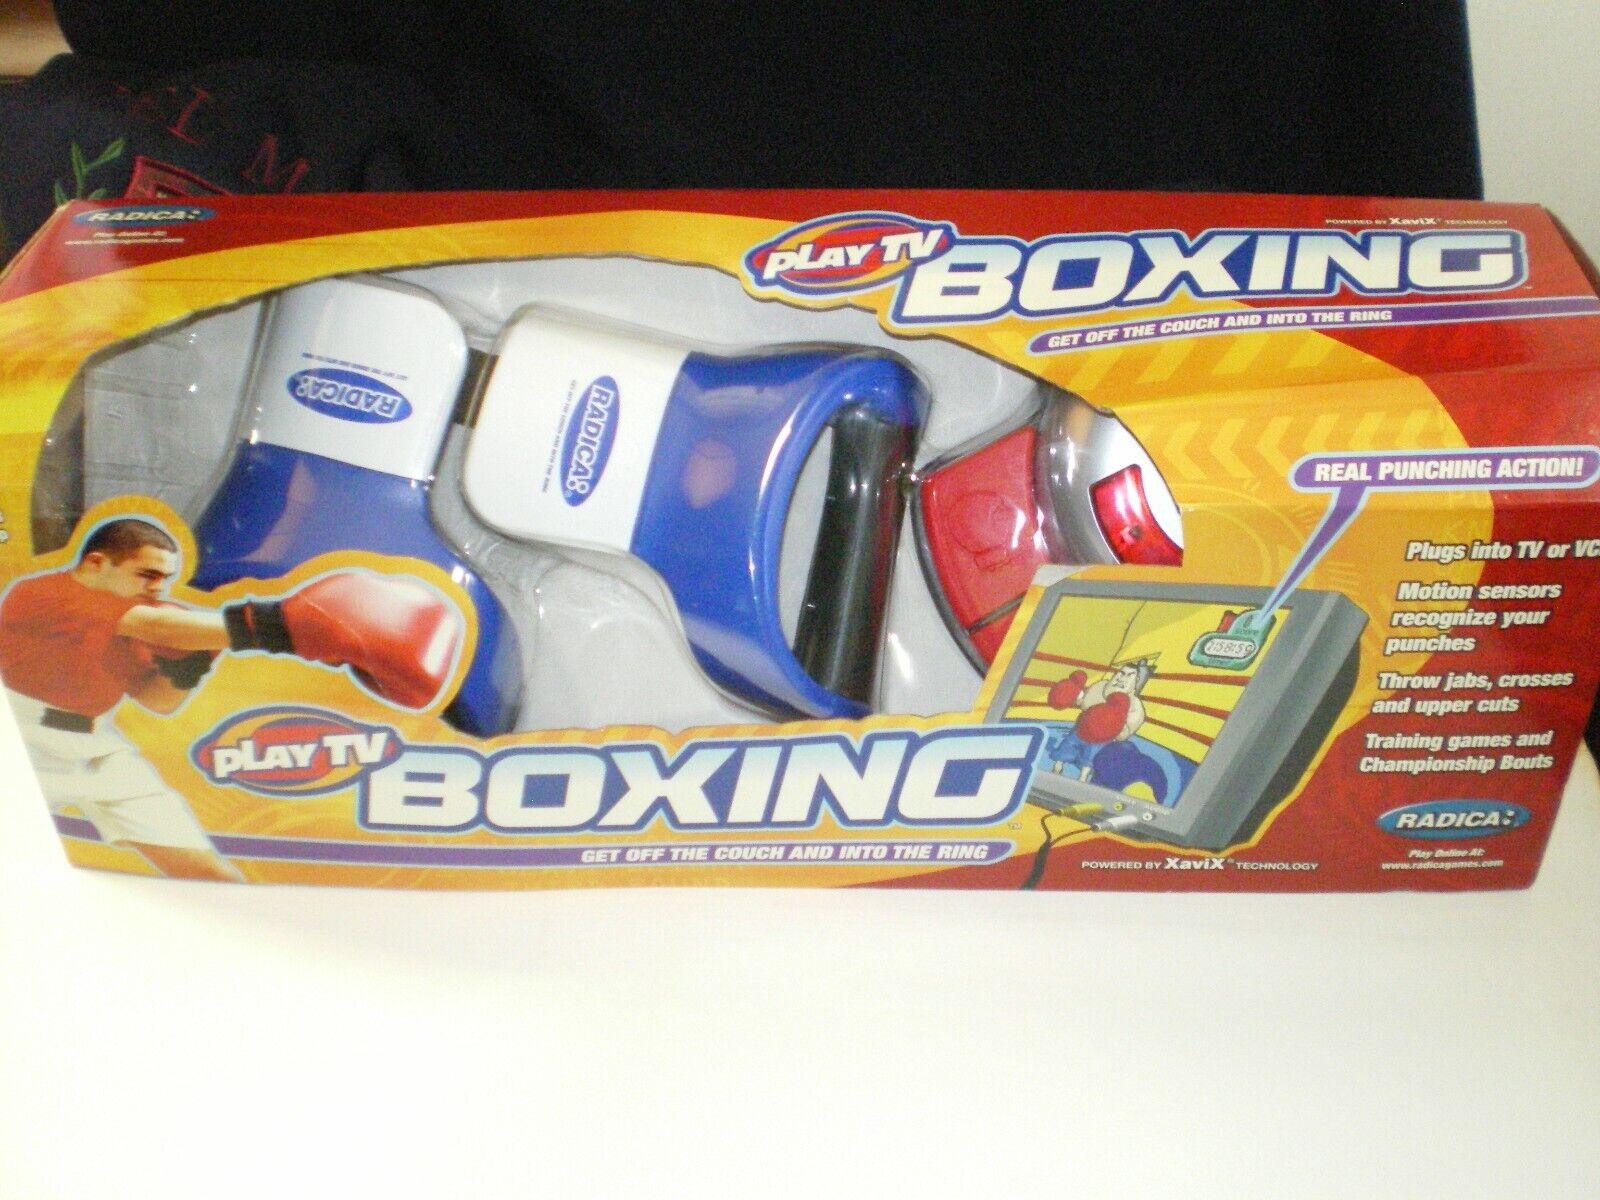 Vintage/New Radica Play TV Boxing Plug N Play